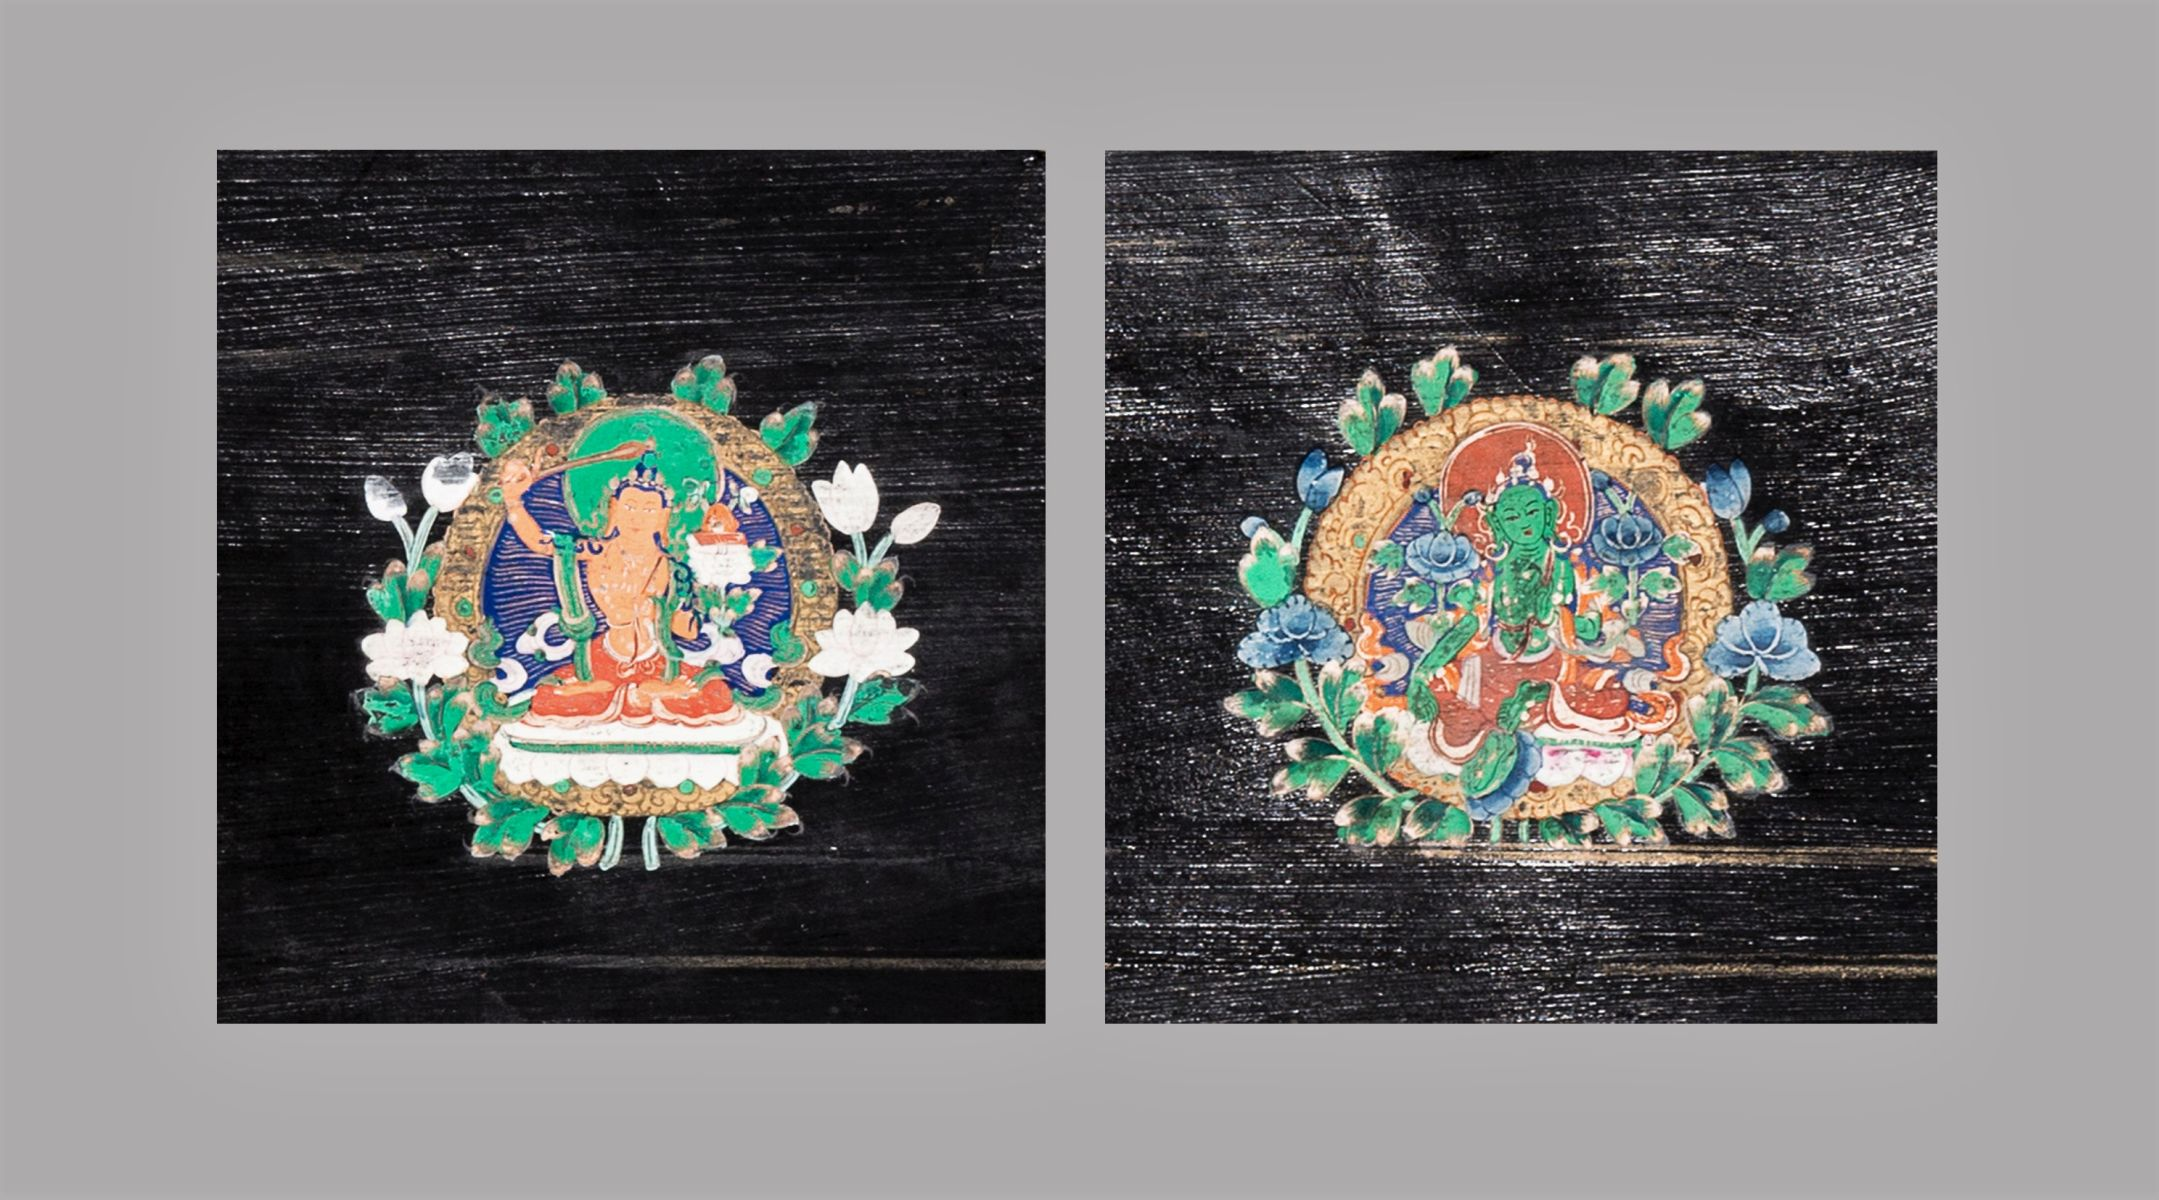 #194 Two Tsakali of Manjushri and Tara | Zwei Tsakali von Manjushri und Tara Image